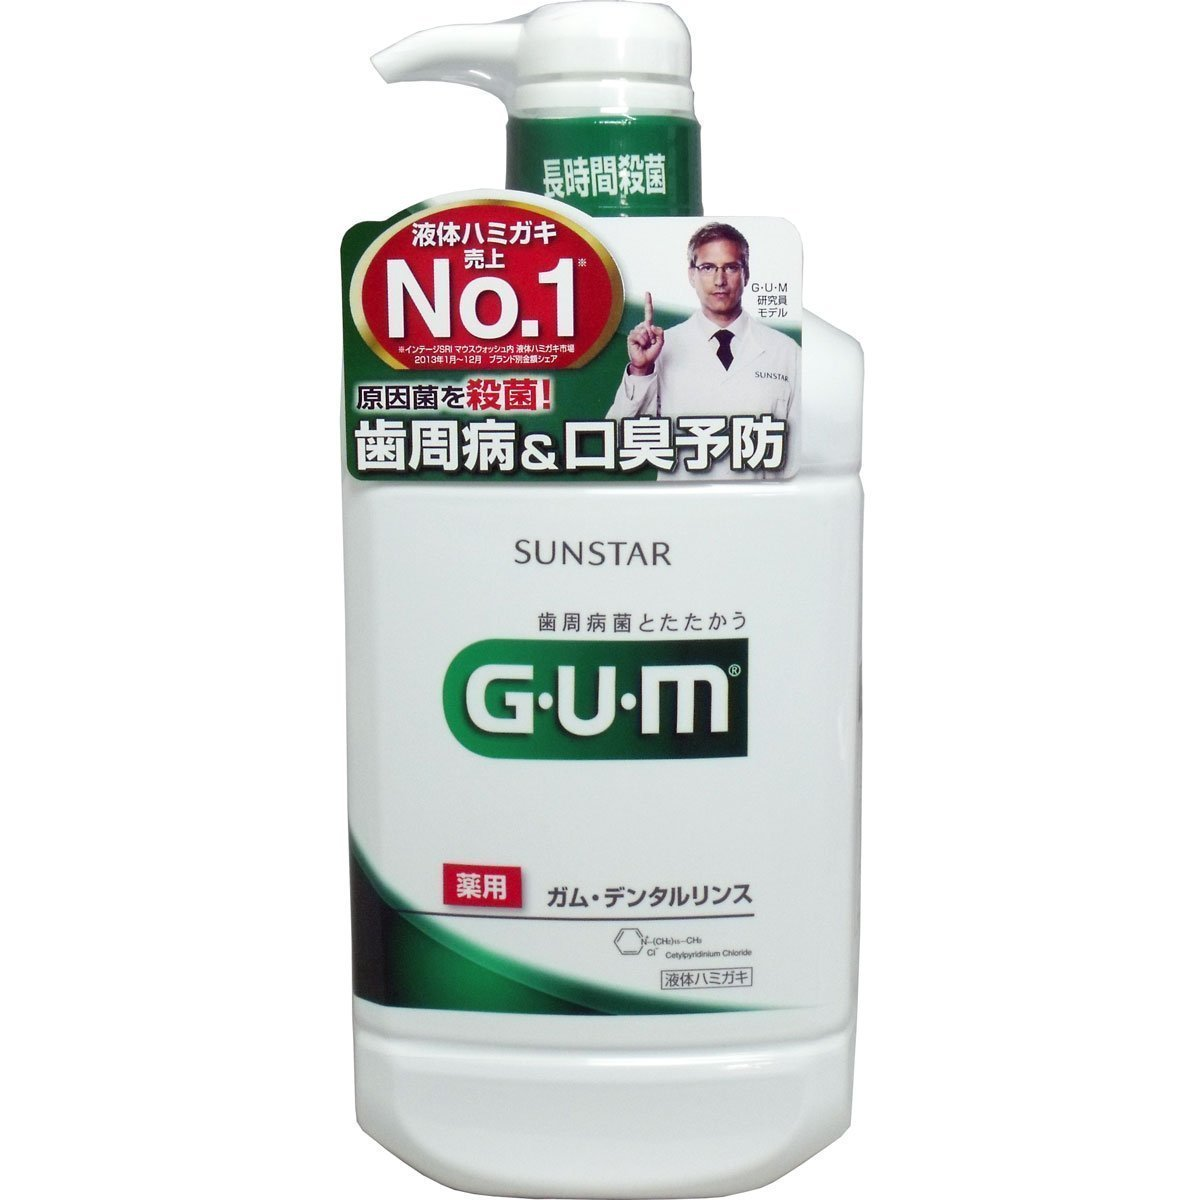 GUM(ガム)・デンタルリンス (レギュラータイプ) 960mL (医薬部外品)